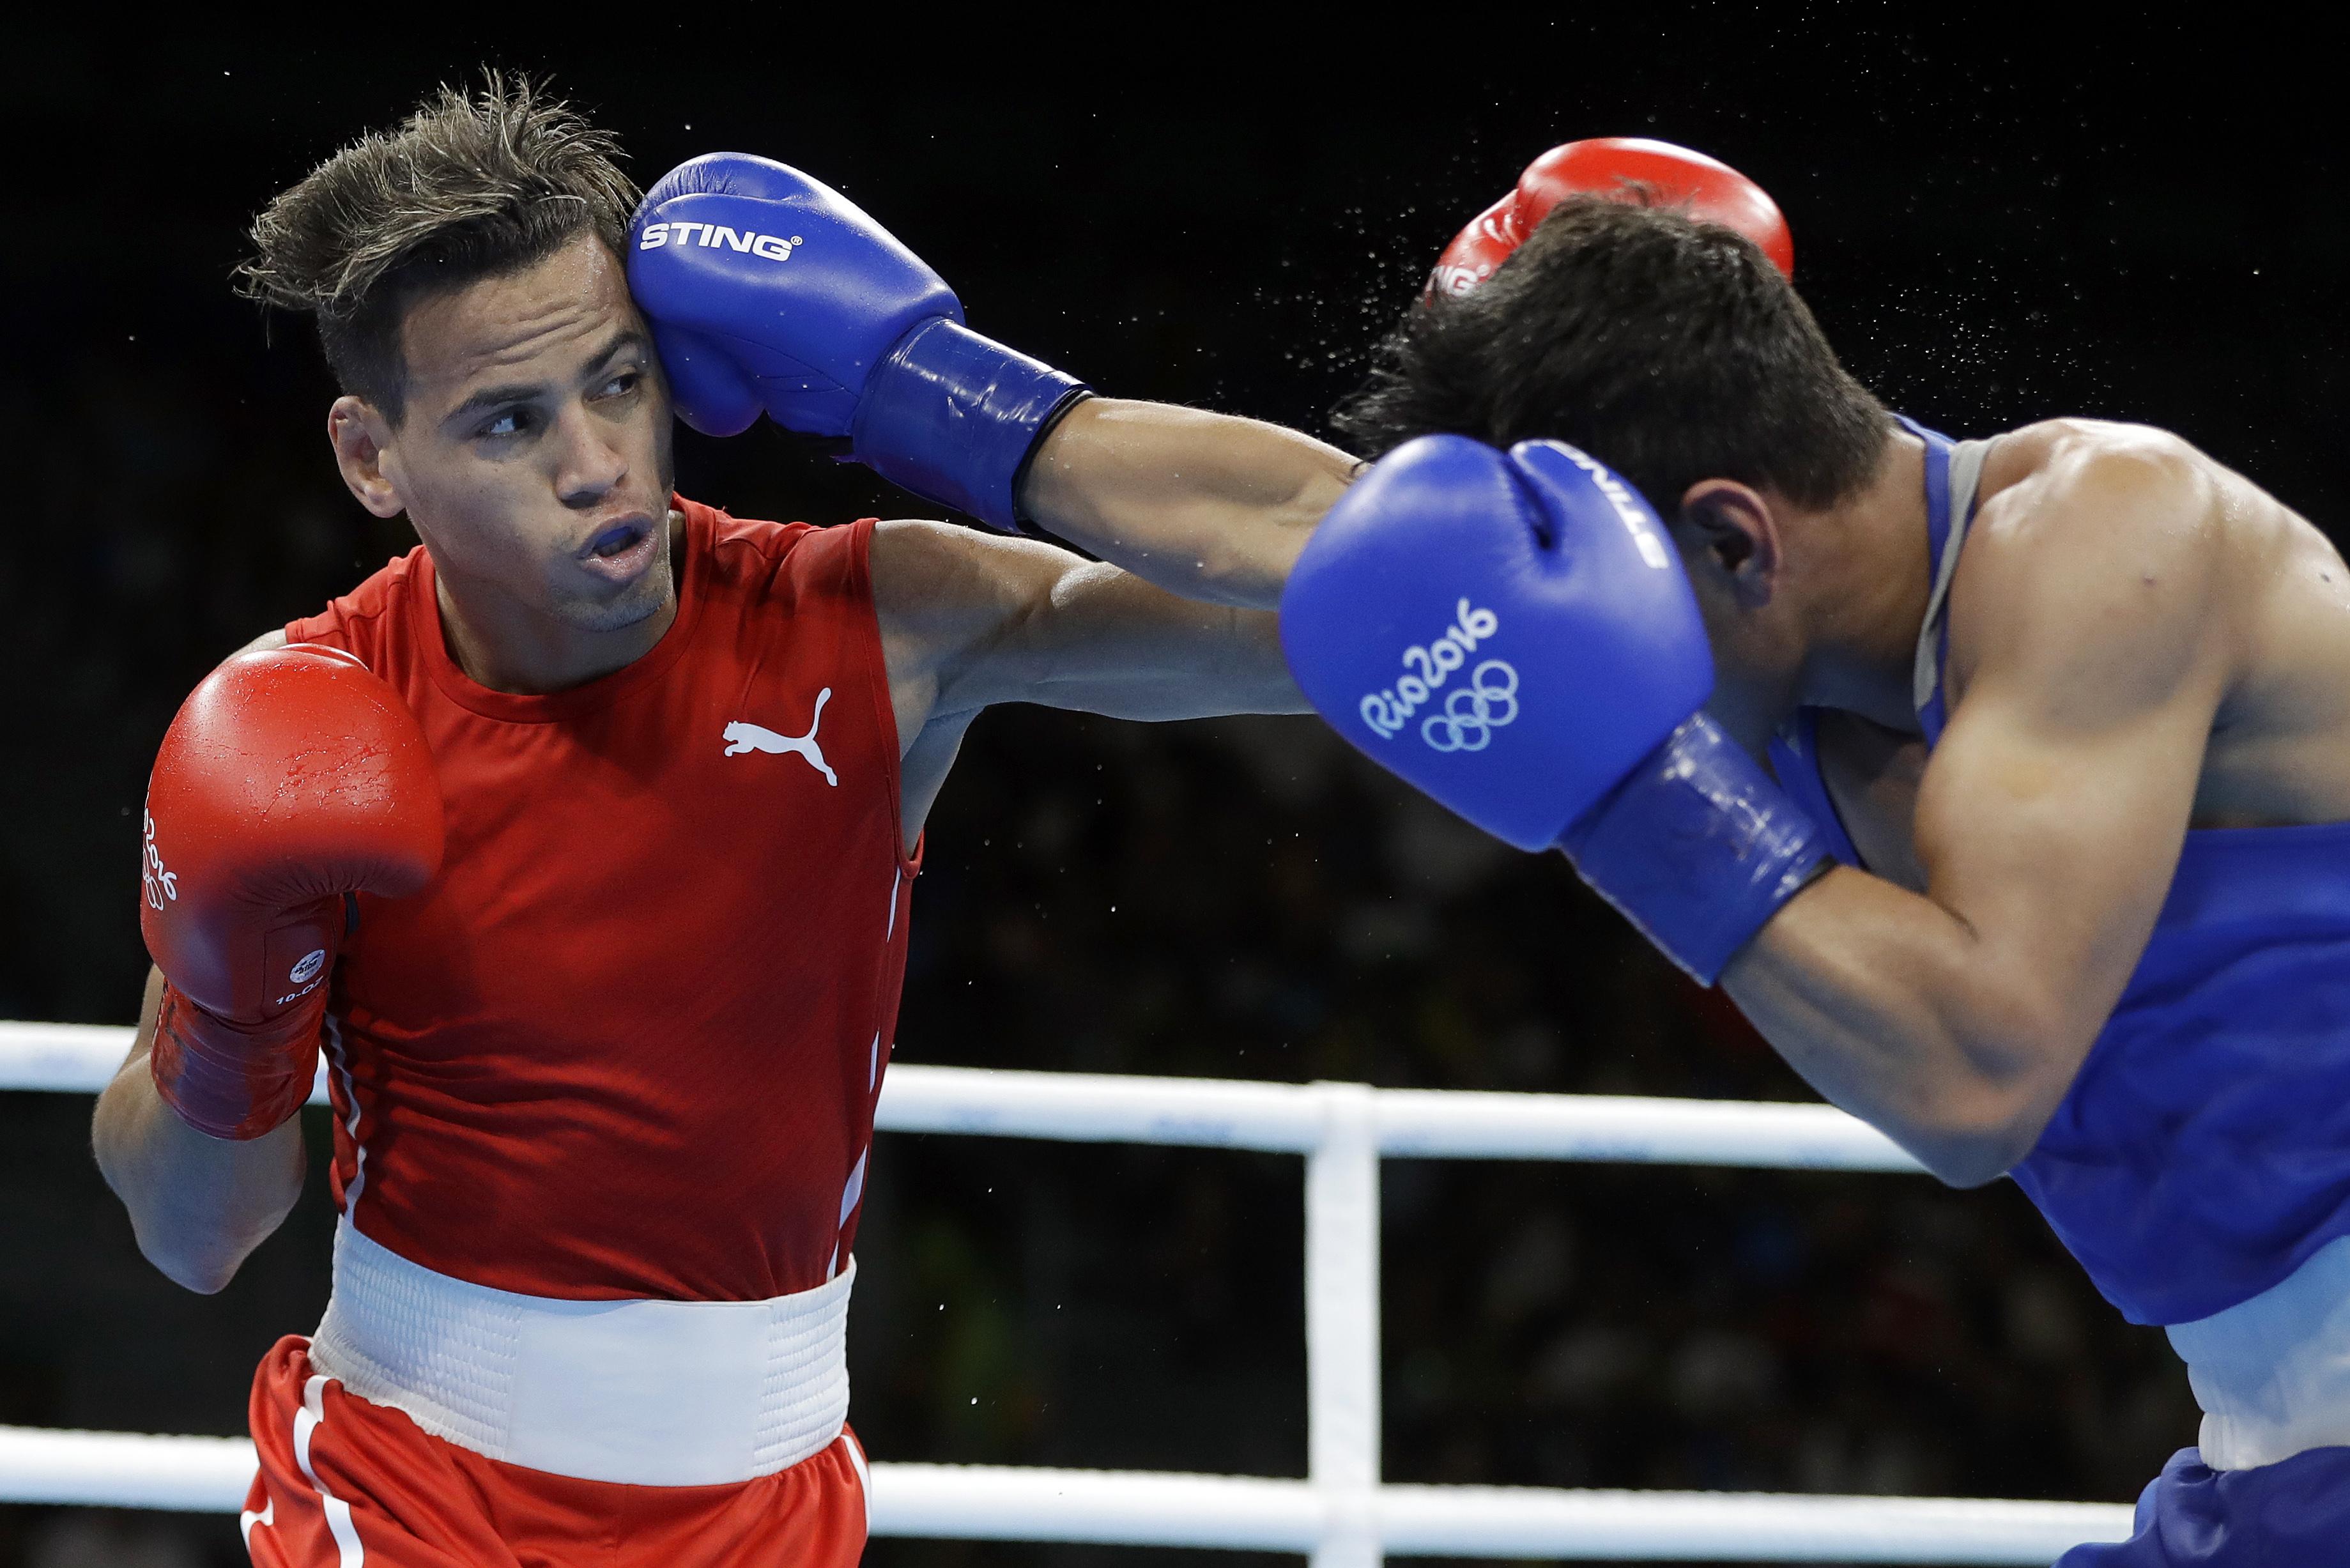 Cuba's Robeisy Ramirez, left, and Uzbekistan's Murodjon Akhmadaliev exchange punches during a men's bantamweight 56-kg semifinals boxing match at the 2016 Summer Olympics in Rio de Janeiro, Brazil, Thursday, Aug. 18, 2016. (AP Photo/Frank Franklin II)